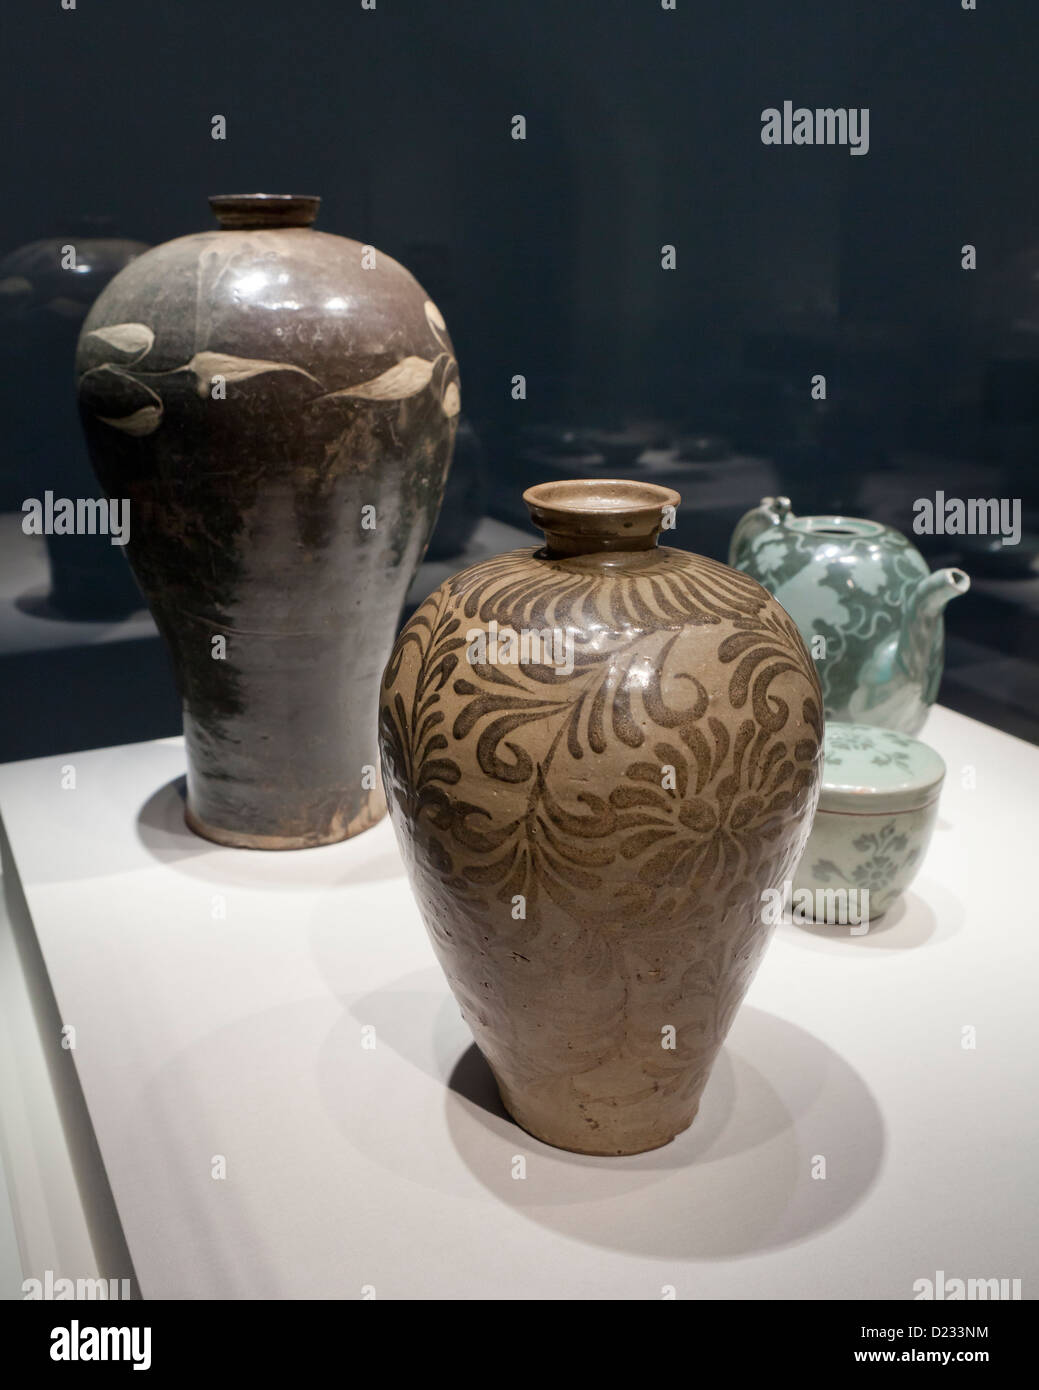 Korean stoneware jars from the Goryeo period, 12th century - Stock Image